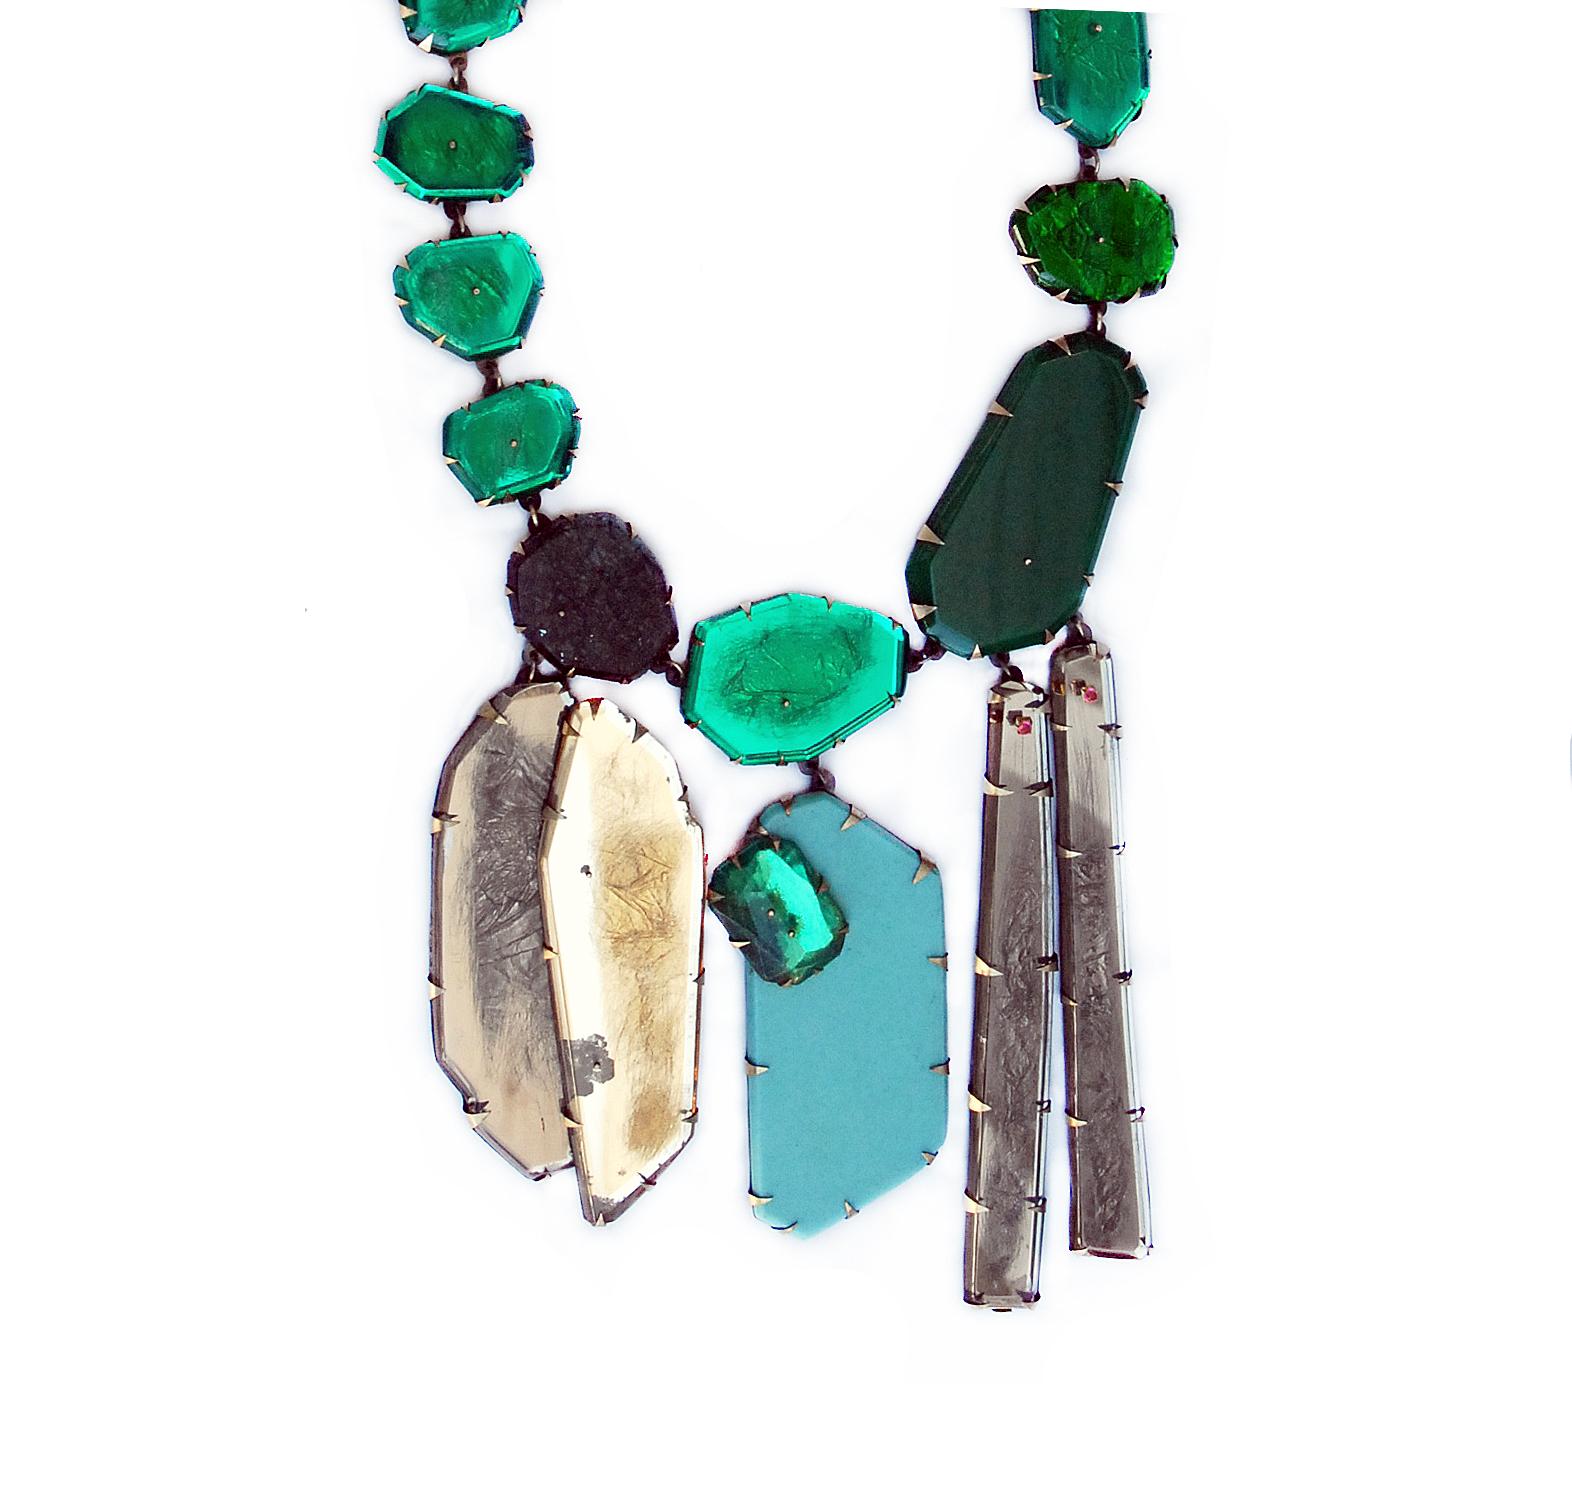 necklace detail.jpg